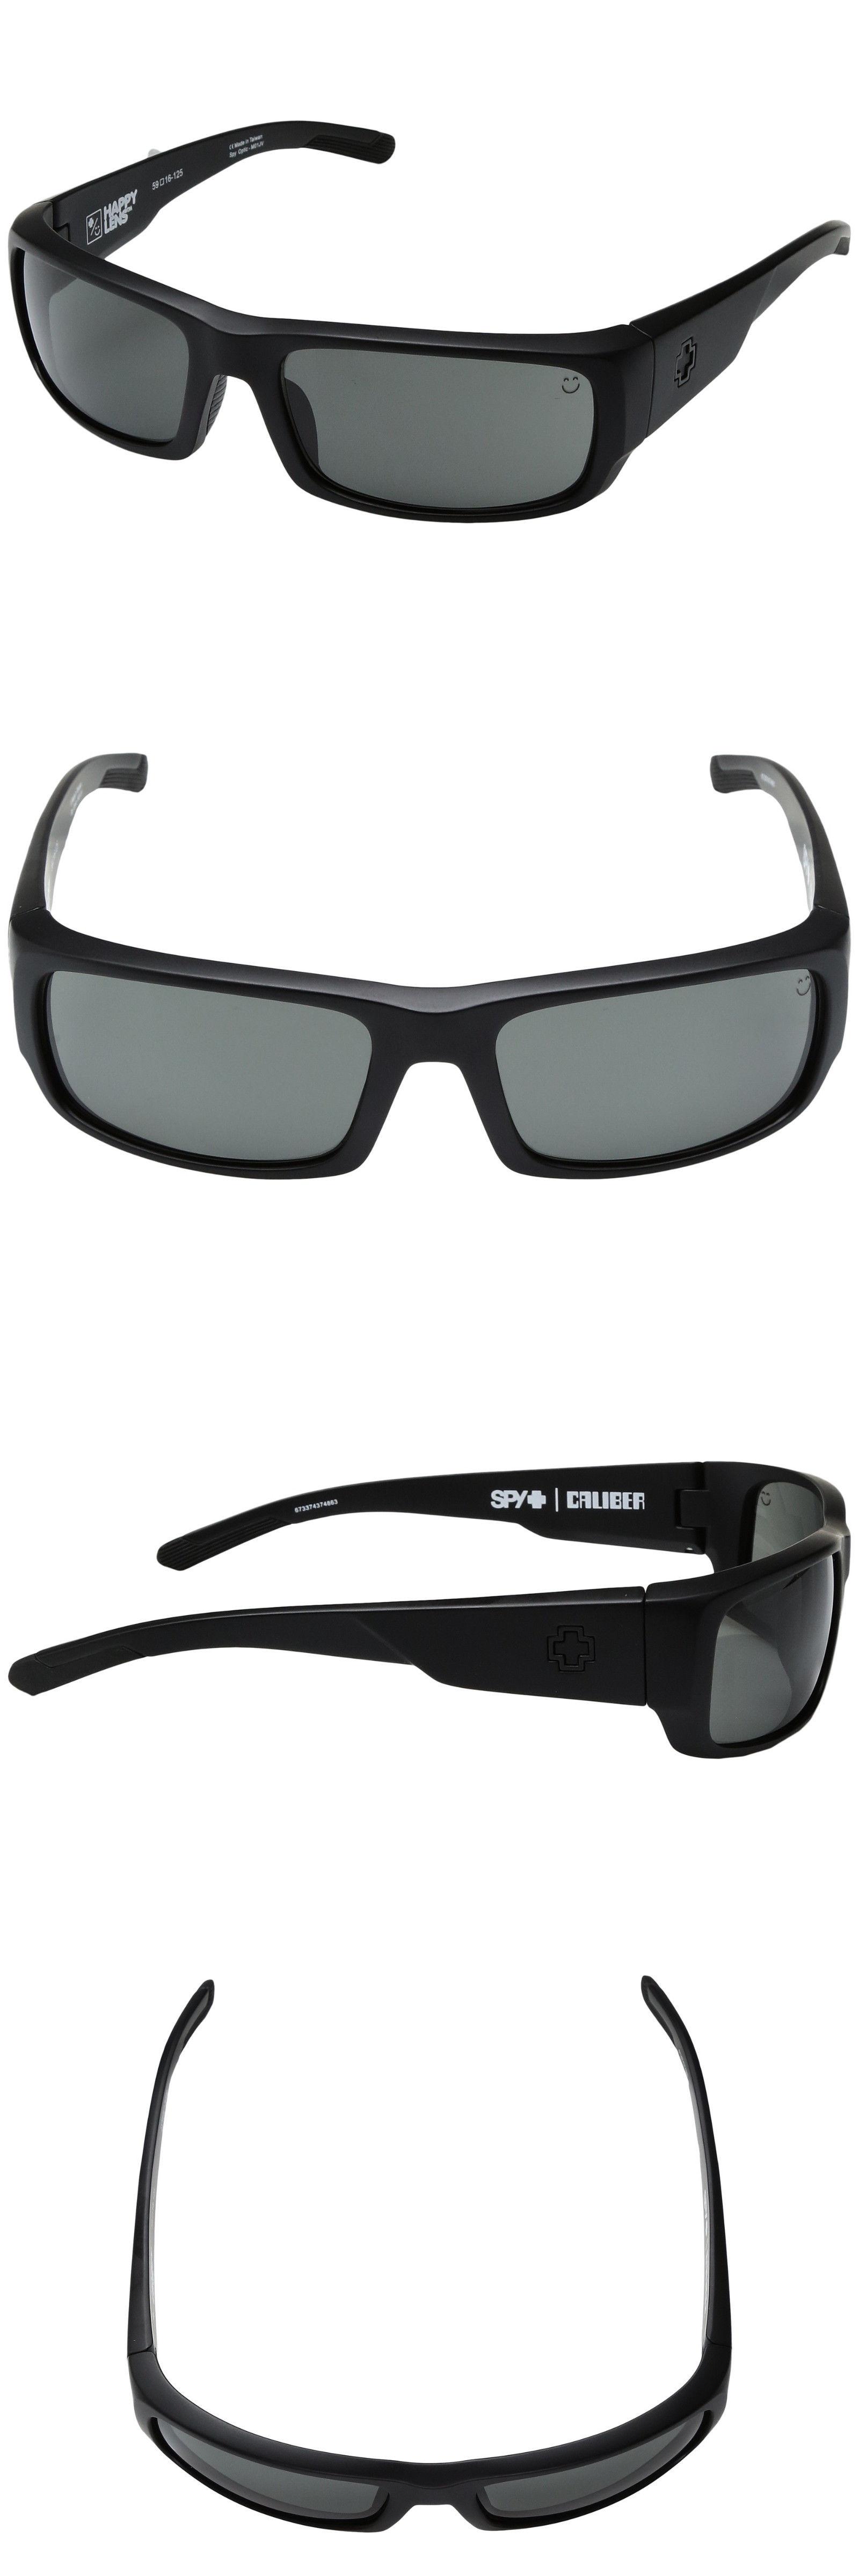 229334eceda Sunglasses 155189  New Men S Spy Optic Caliber Wrap Sunglasses Matte Black  Happy Gray Green -  BUY IT NOW ONLY   36.99 on eBay!